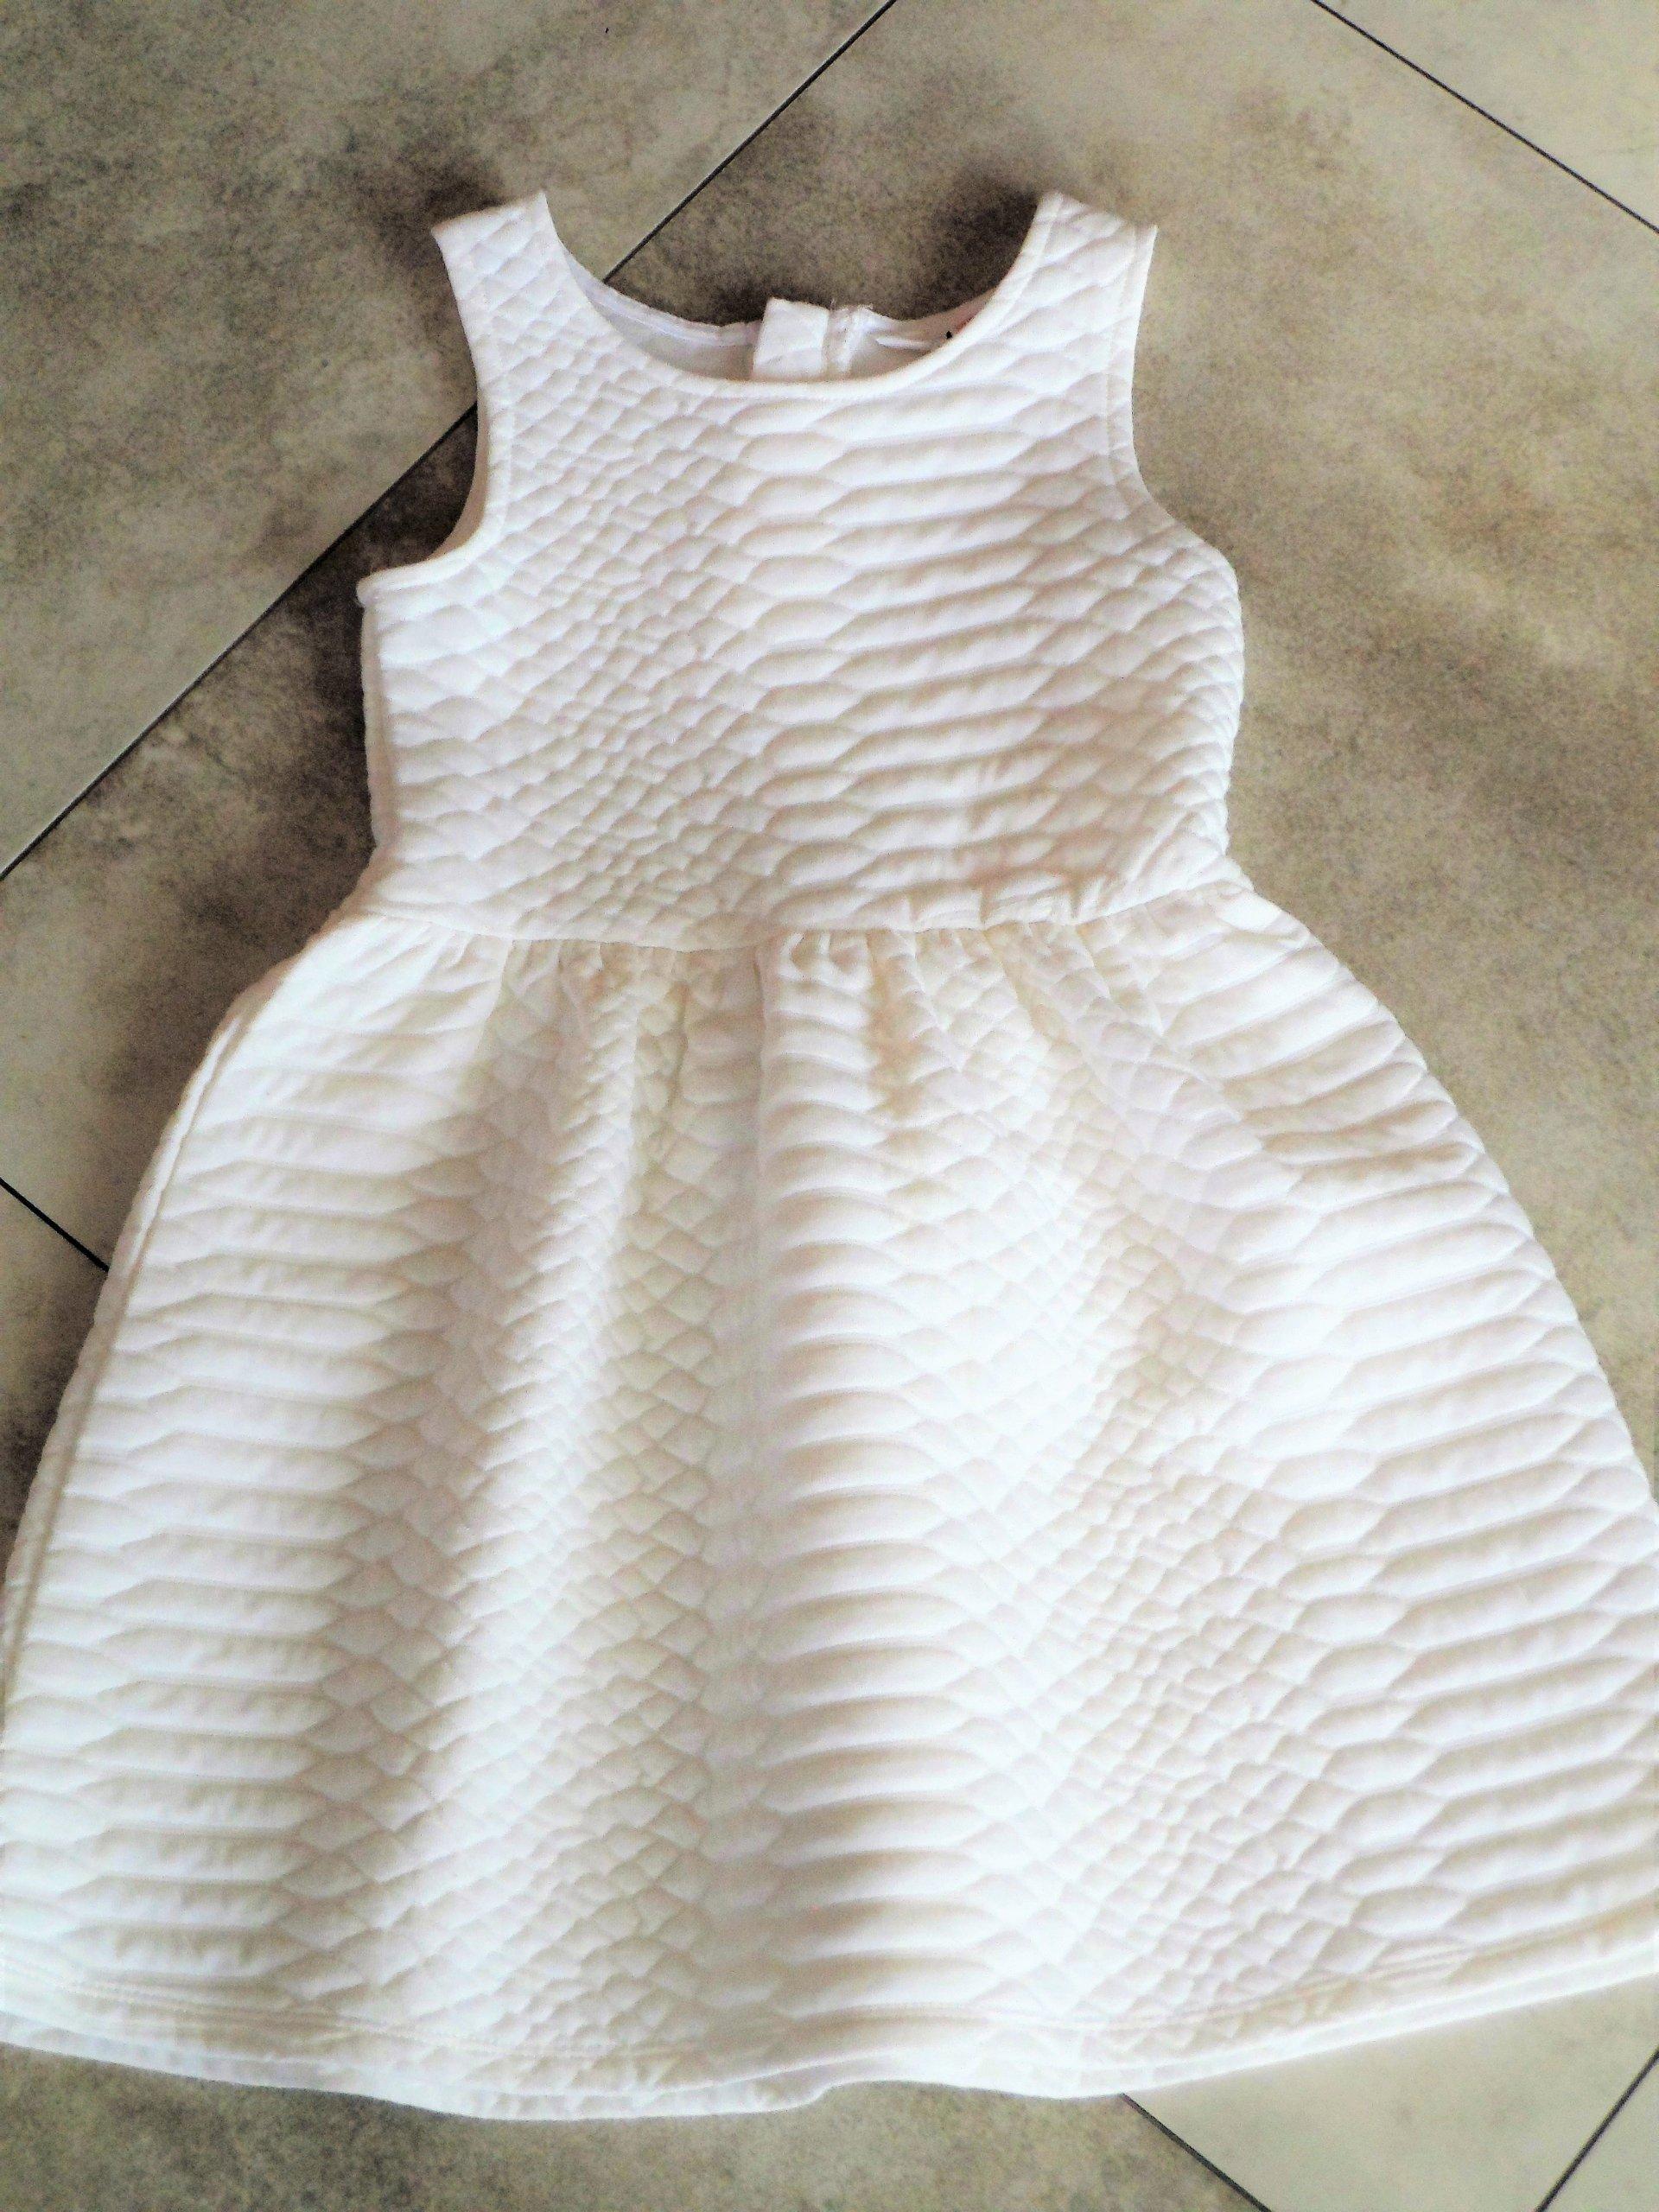 2c6099290e H M piękna mięciutka biała sukienka 110 116 - 7187693132 - oficjalne ...